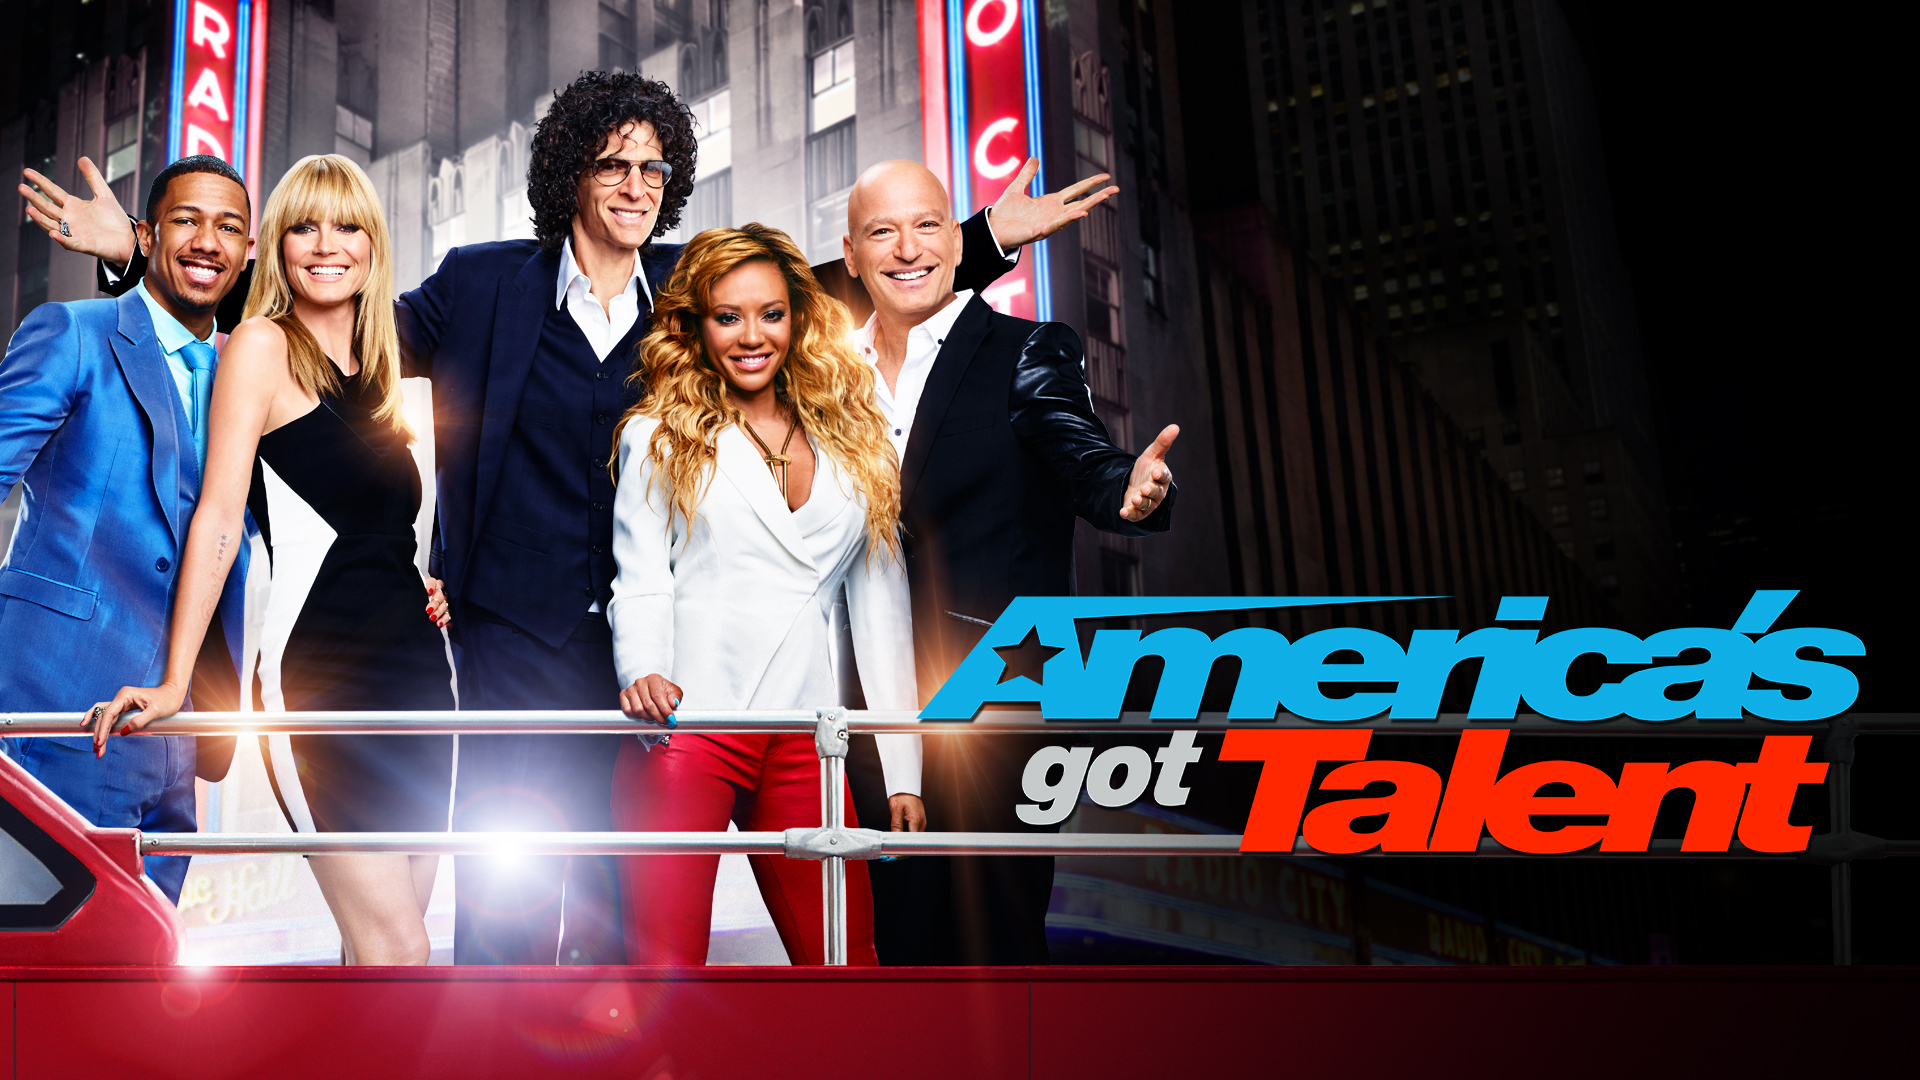 Americas got talent 2017 science guy - America S Got Talent